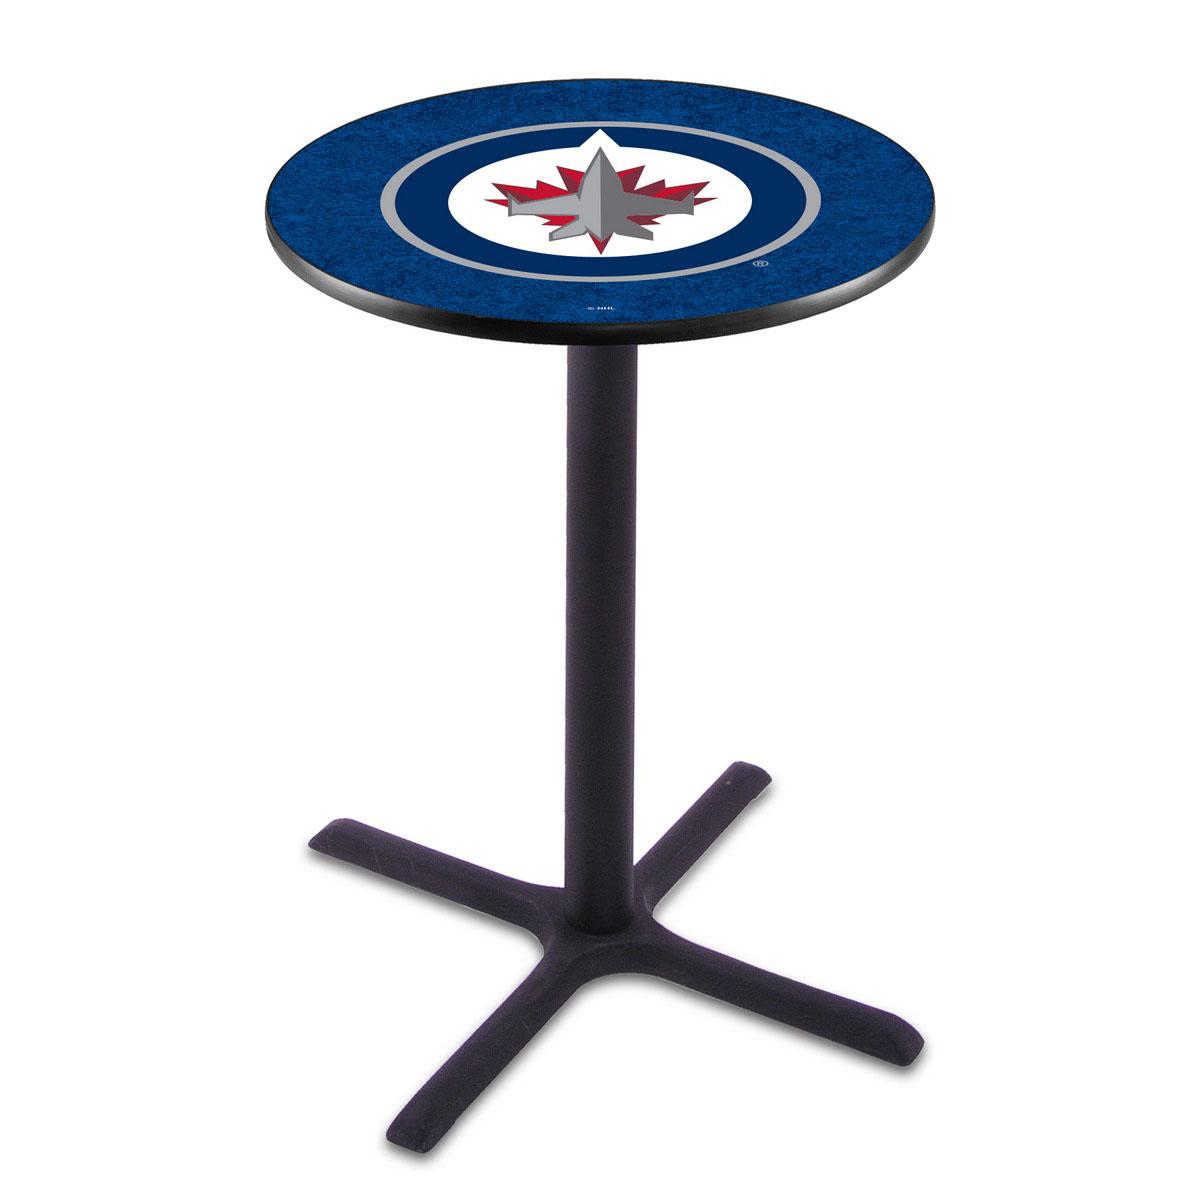 Exquisite Winnipeg Jets Wrinkle Pub Table Product Photo